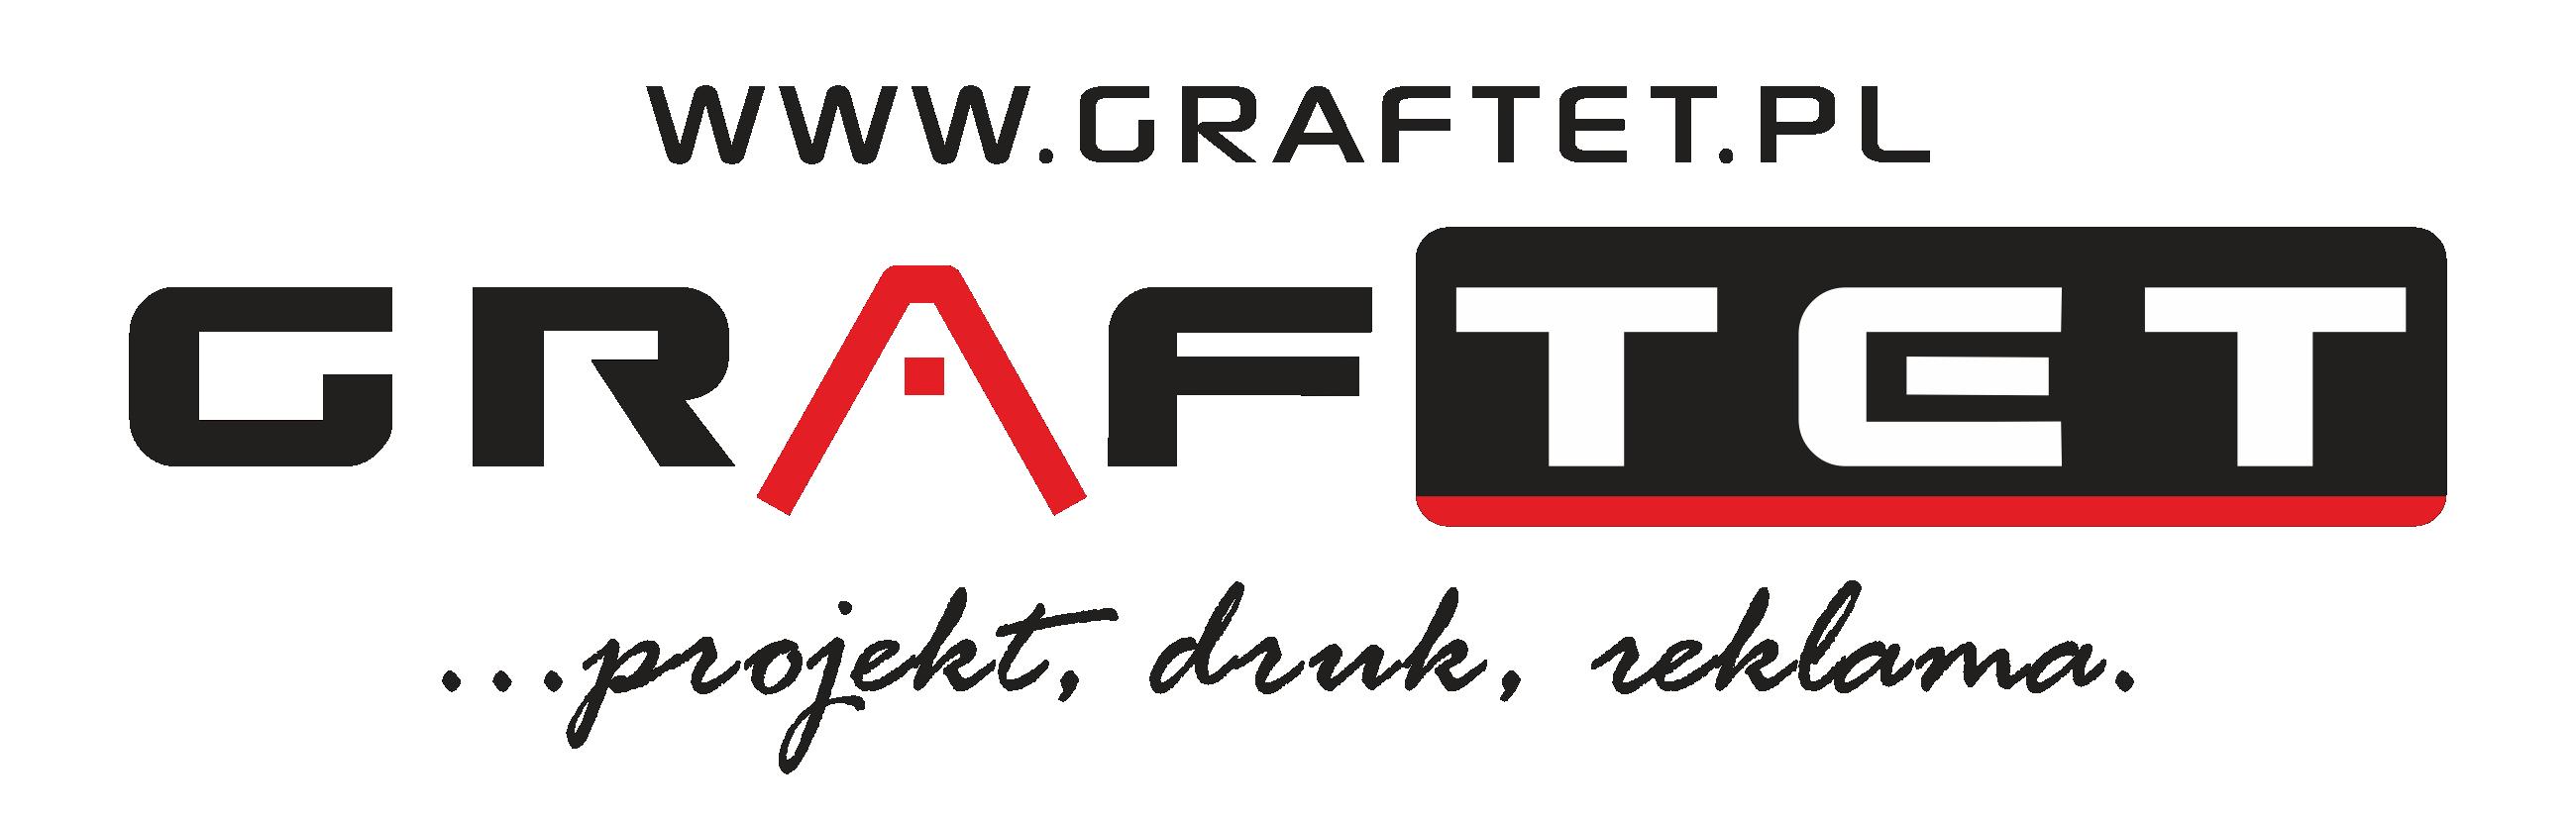 GrafTet - projekt, druk, reklama